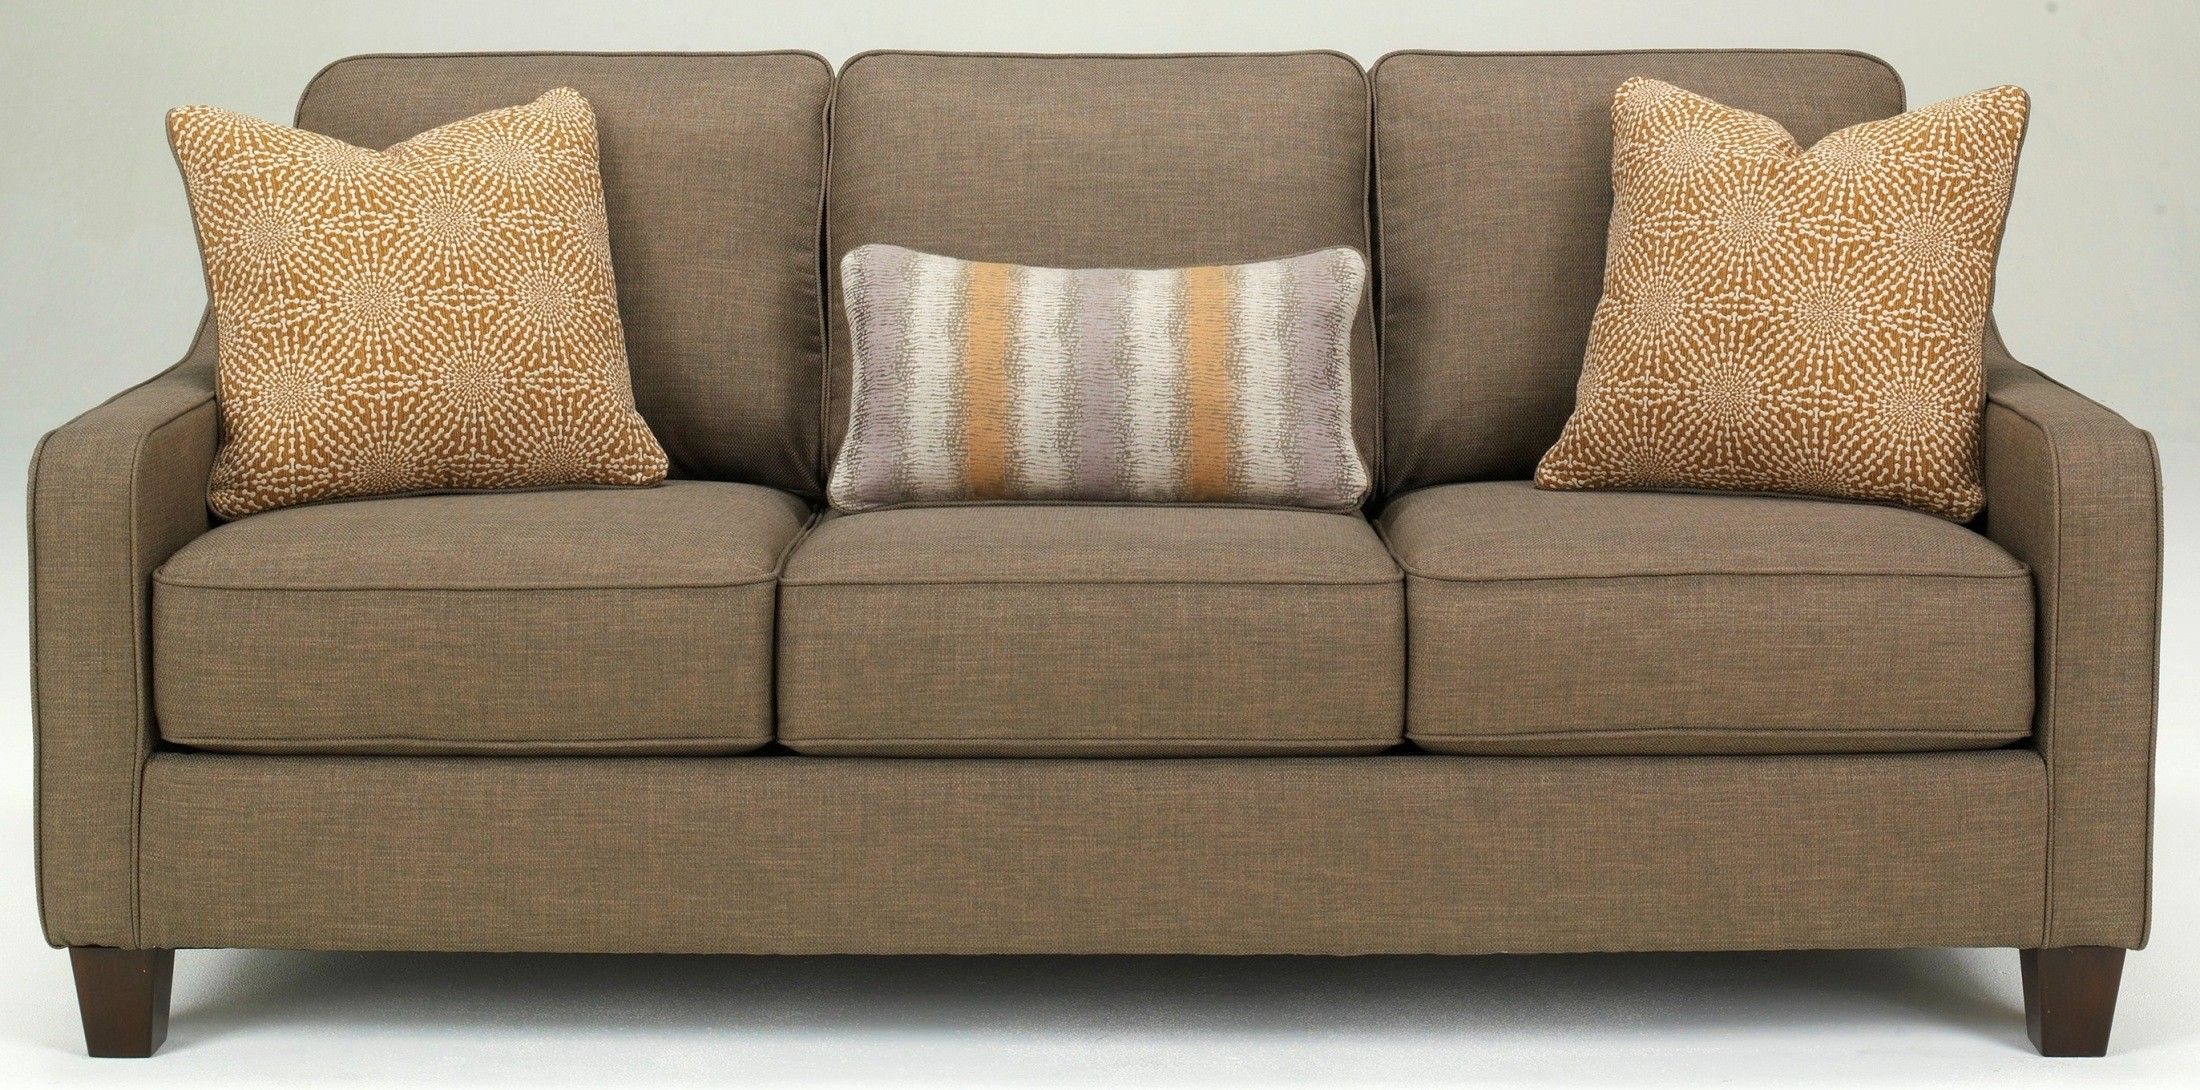 mena granite queen sofa sleeper home decor sleeper sofas on rh pinterest com